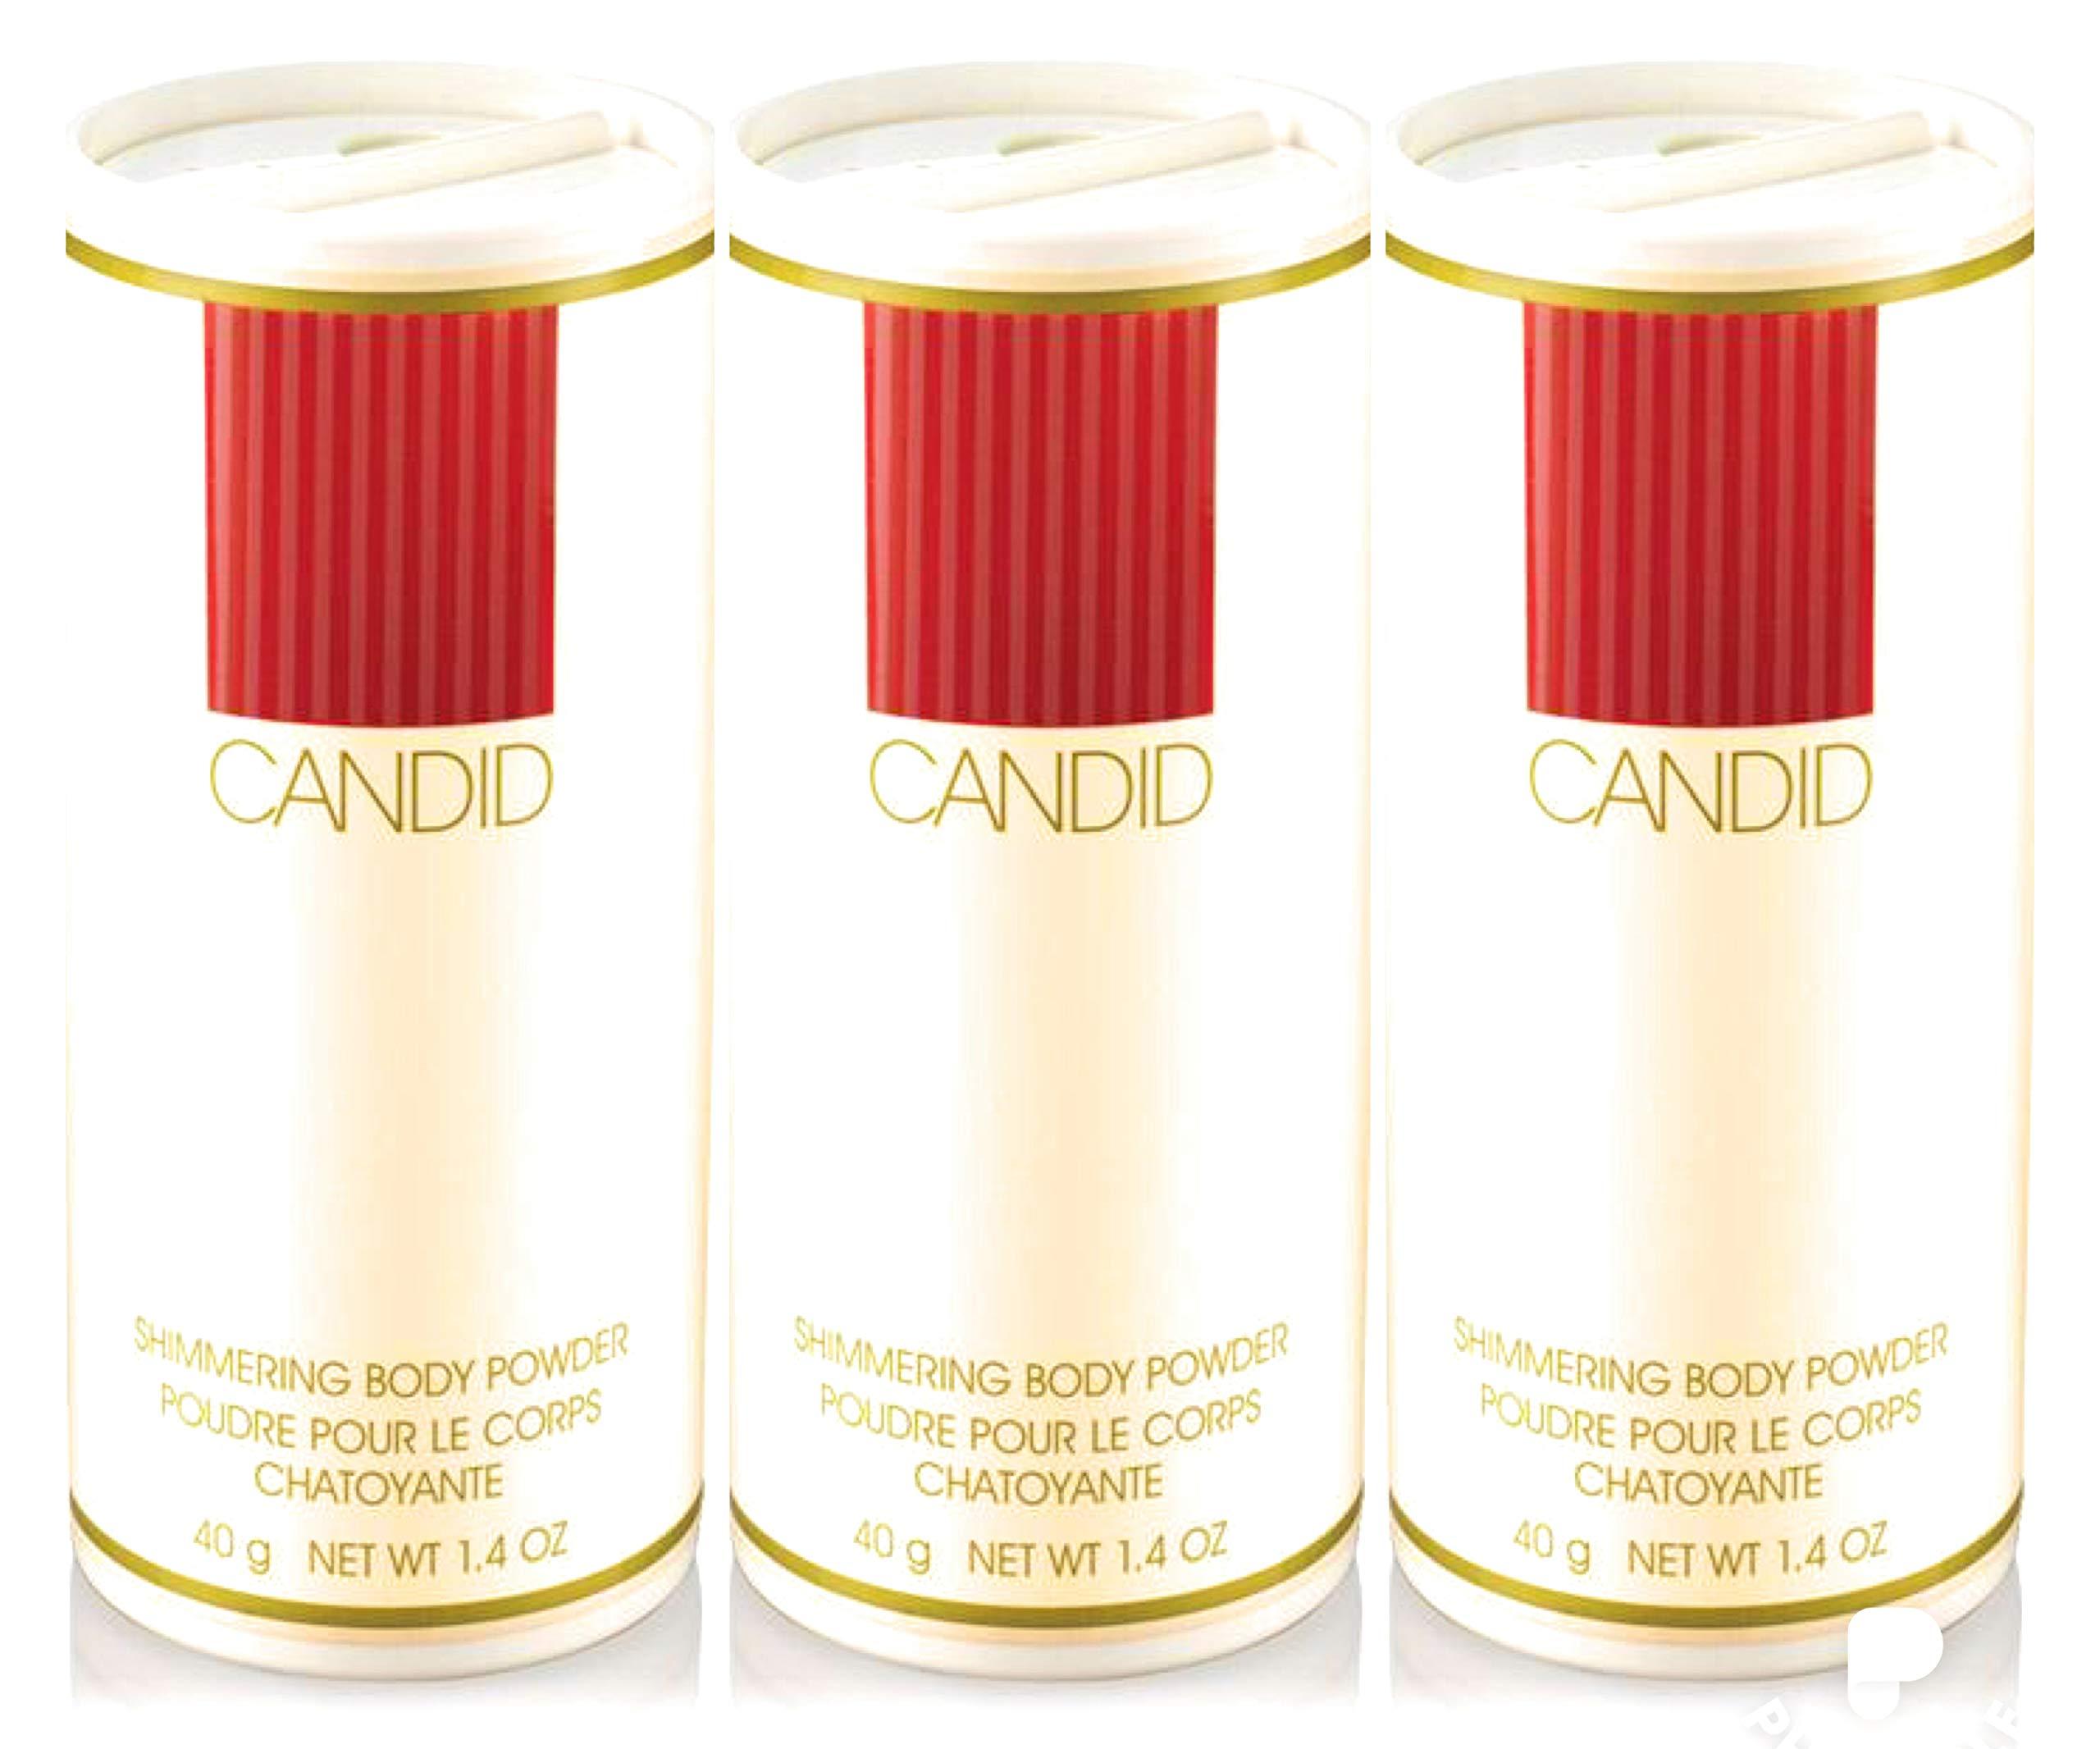 Avon CANDID shimmering body powder talc 1.4 oz each LOT OF 3